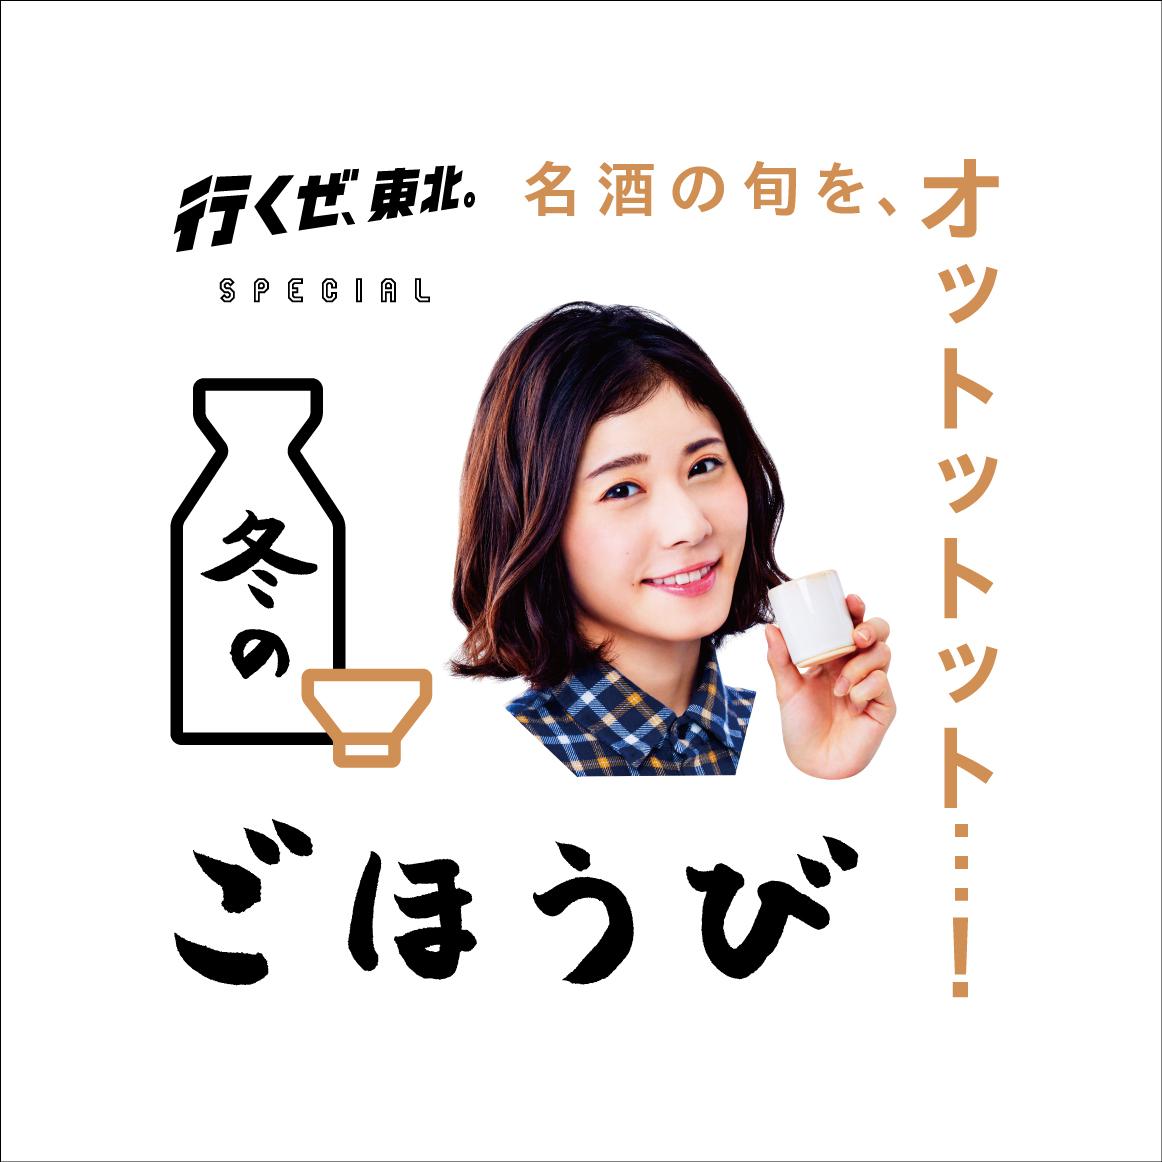 JR_ikuze_2016_fuyu_no_gohobi_guidbook_nakatobira_sake